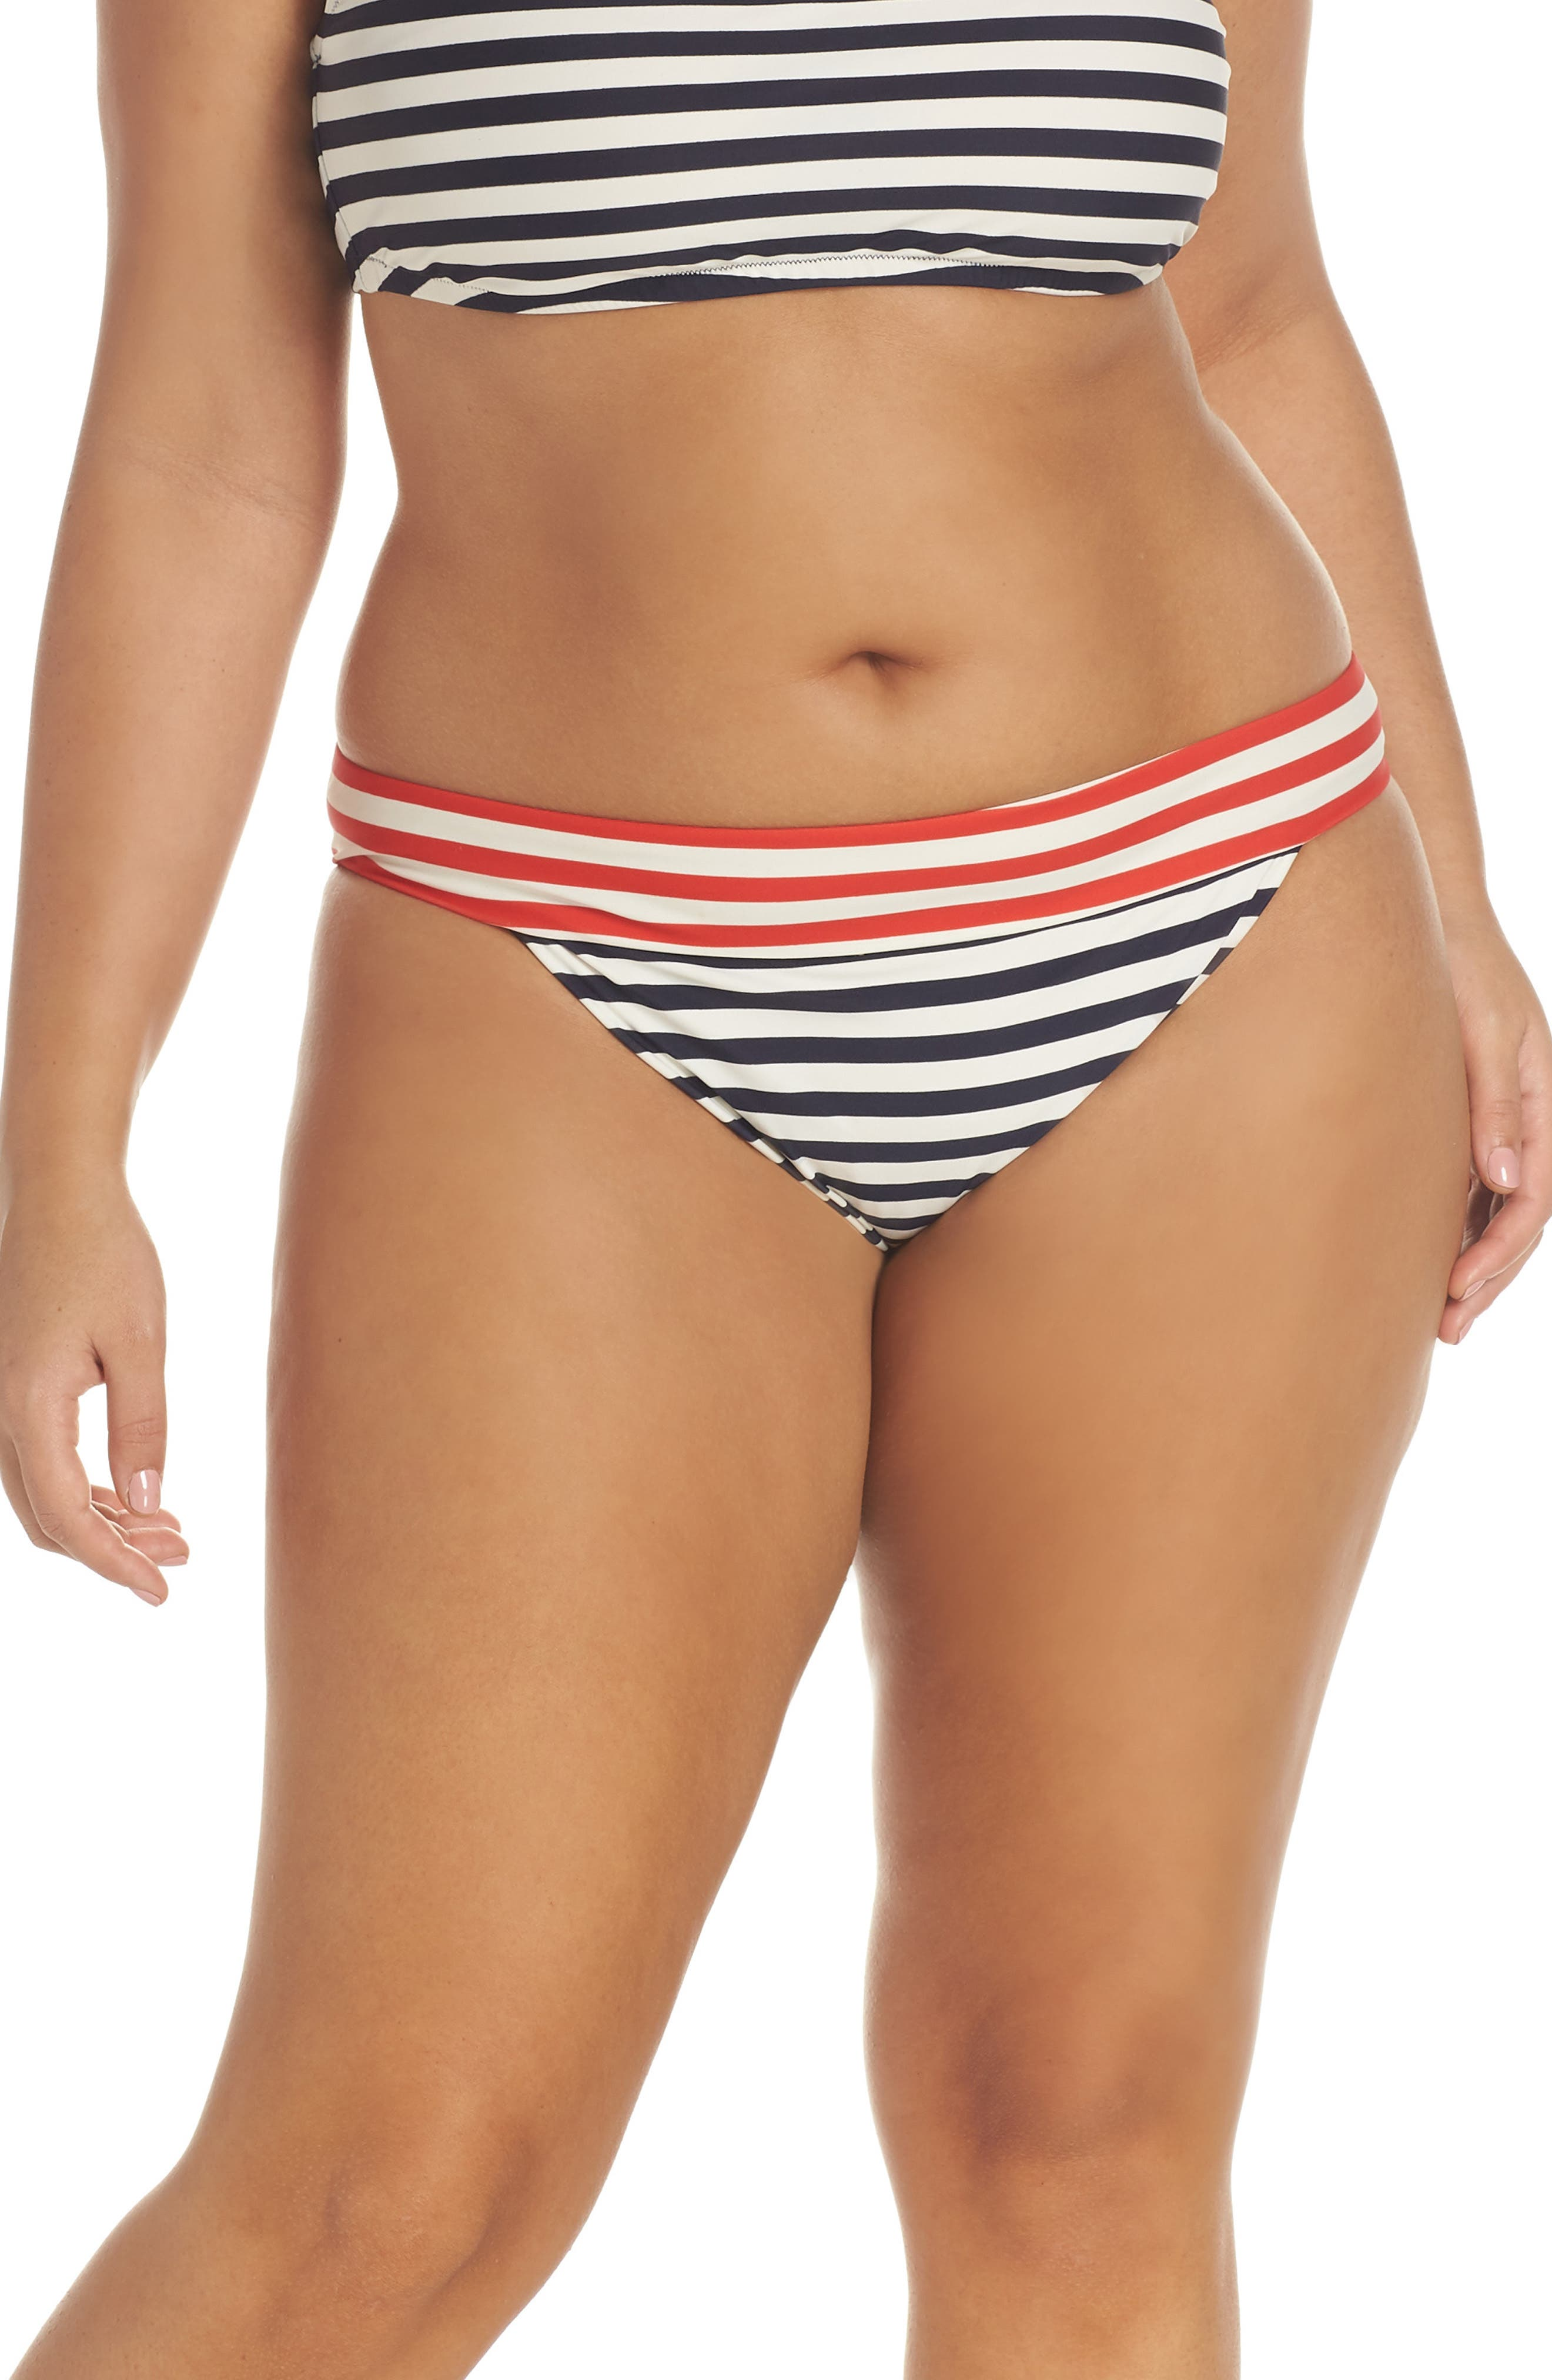 Stripe Banded Bikini Bottoms,                             Main thumbnail 1, color,                             NAVY VIVID FLAME